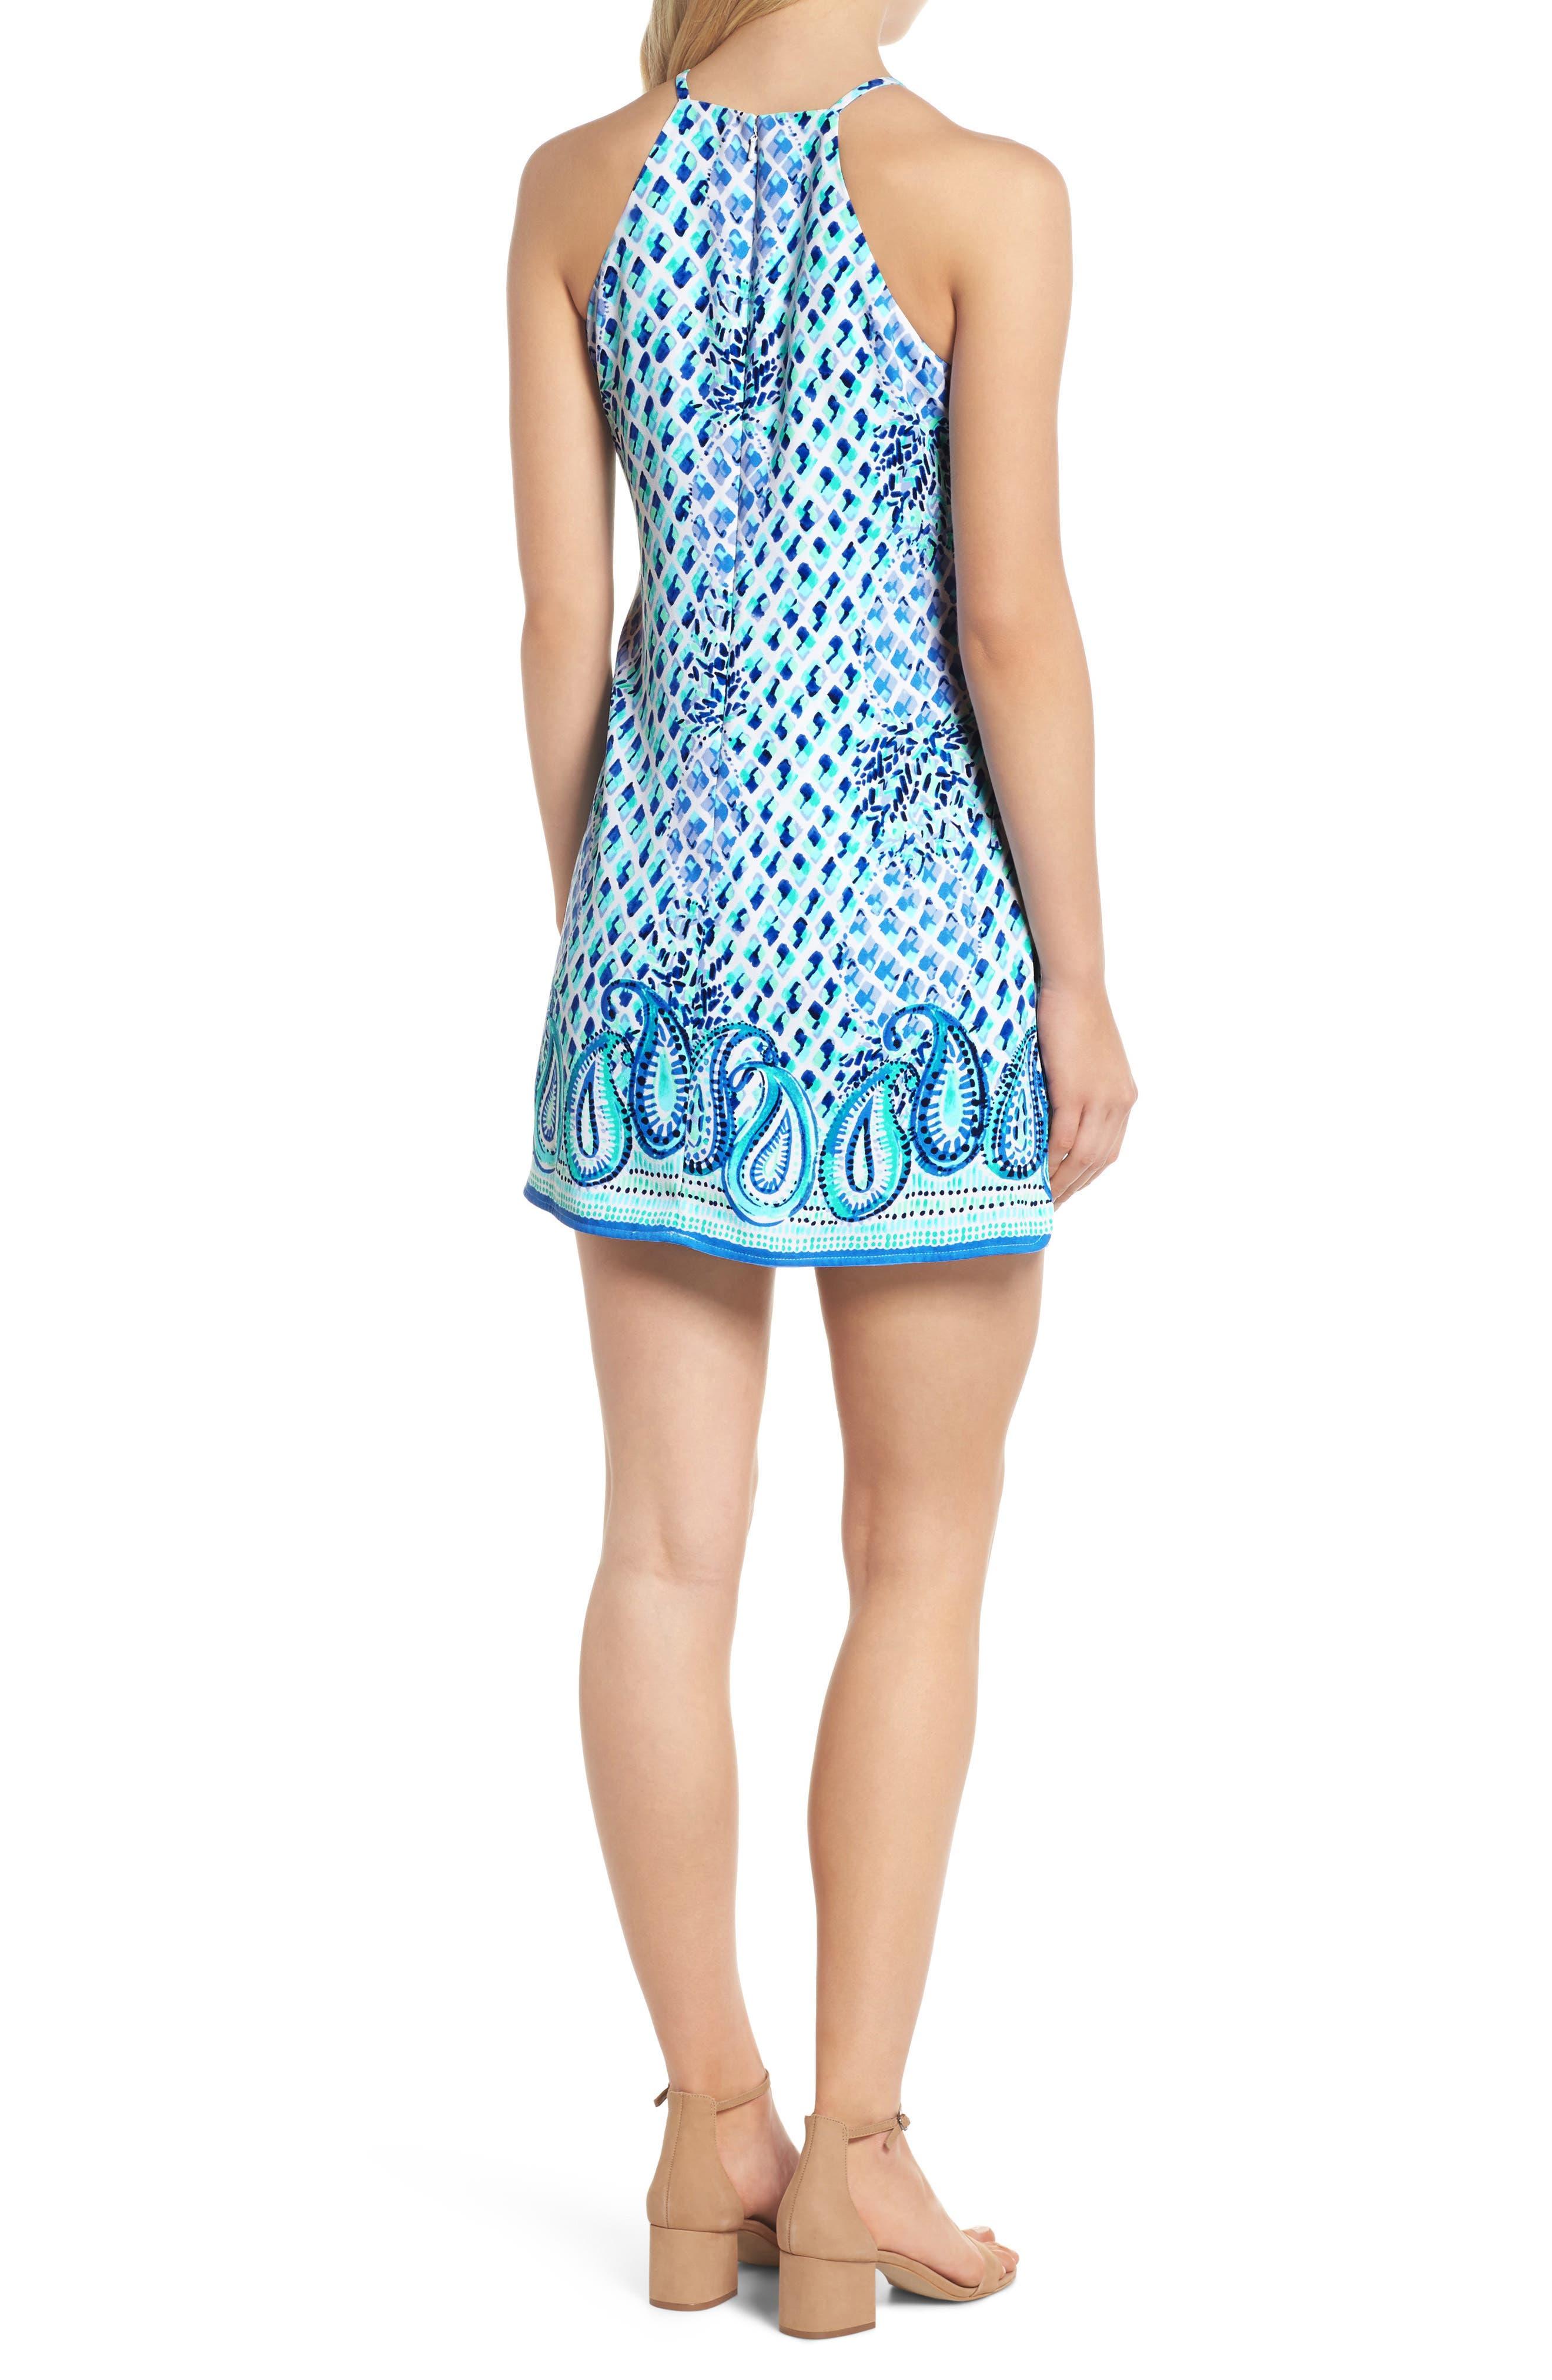 Pearl Romper Dress,                             Alternate thumbnail 2, color,                             Resort White Toe In